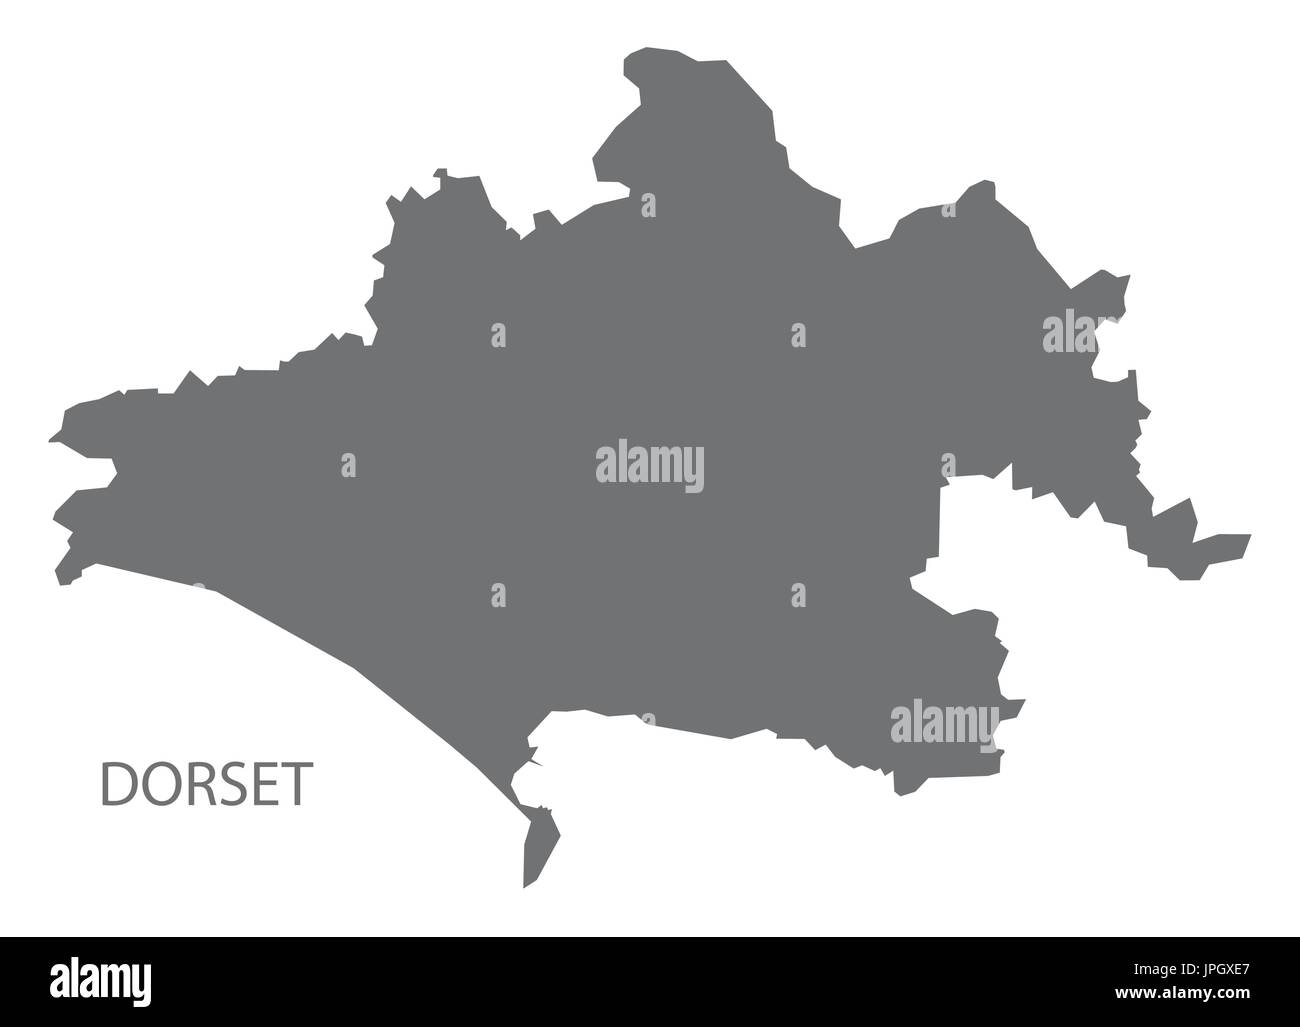 Dorset county map England UK grey illustration silhouette shape